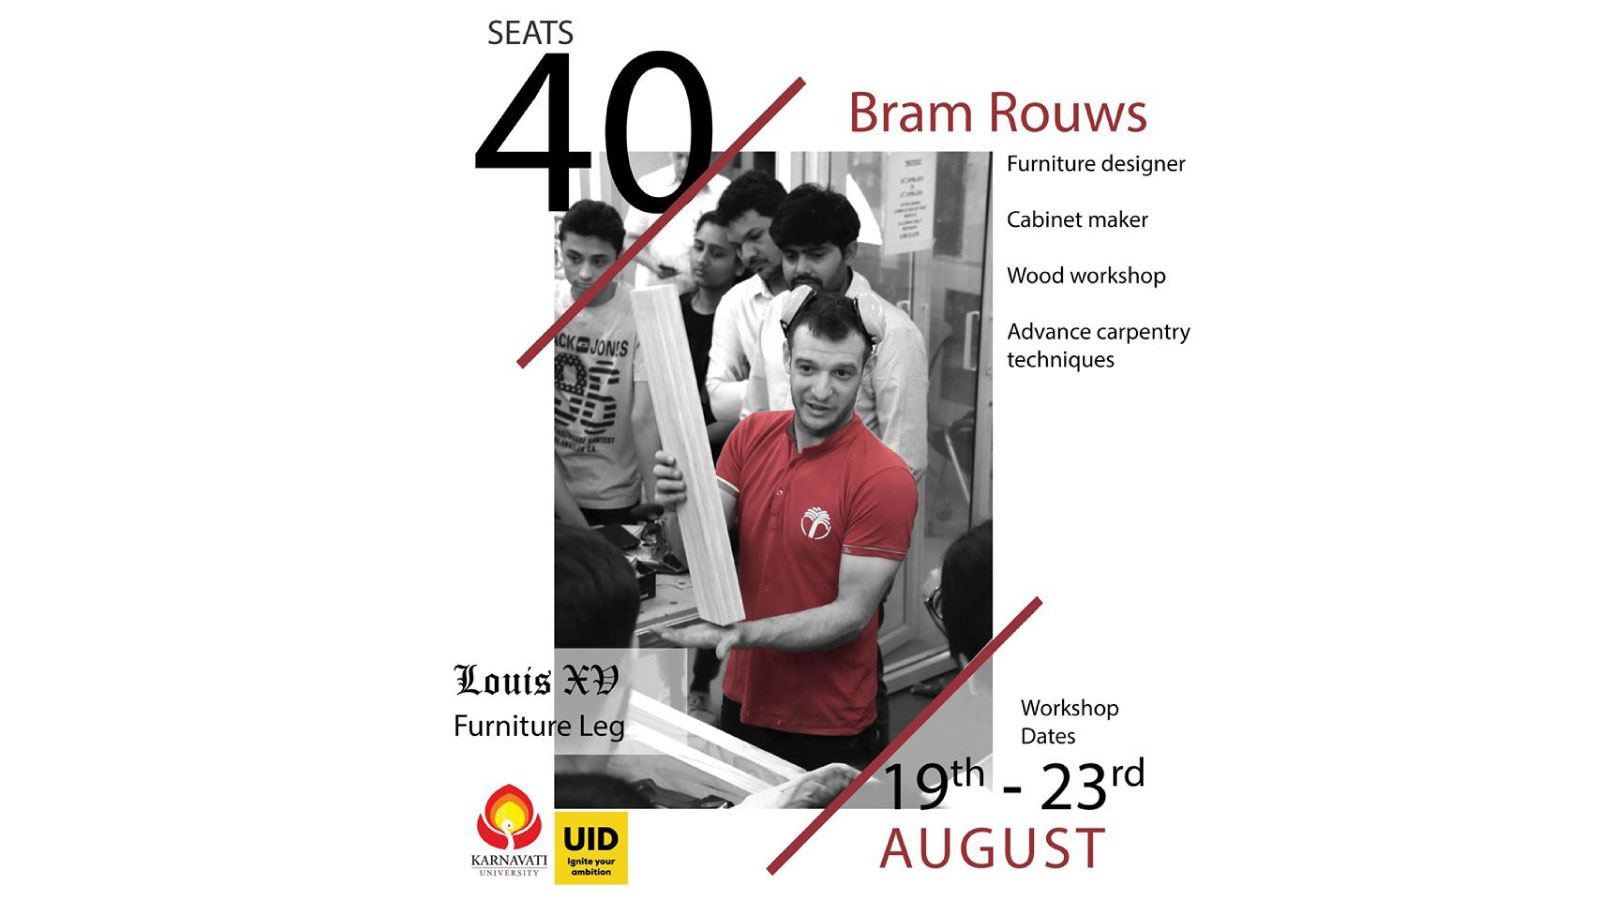 Bram Rouws Workshop Image